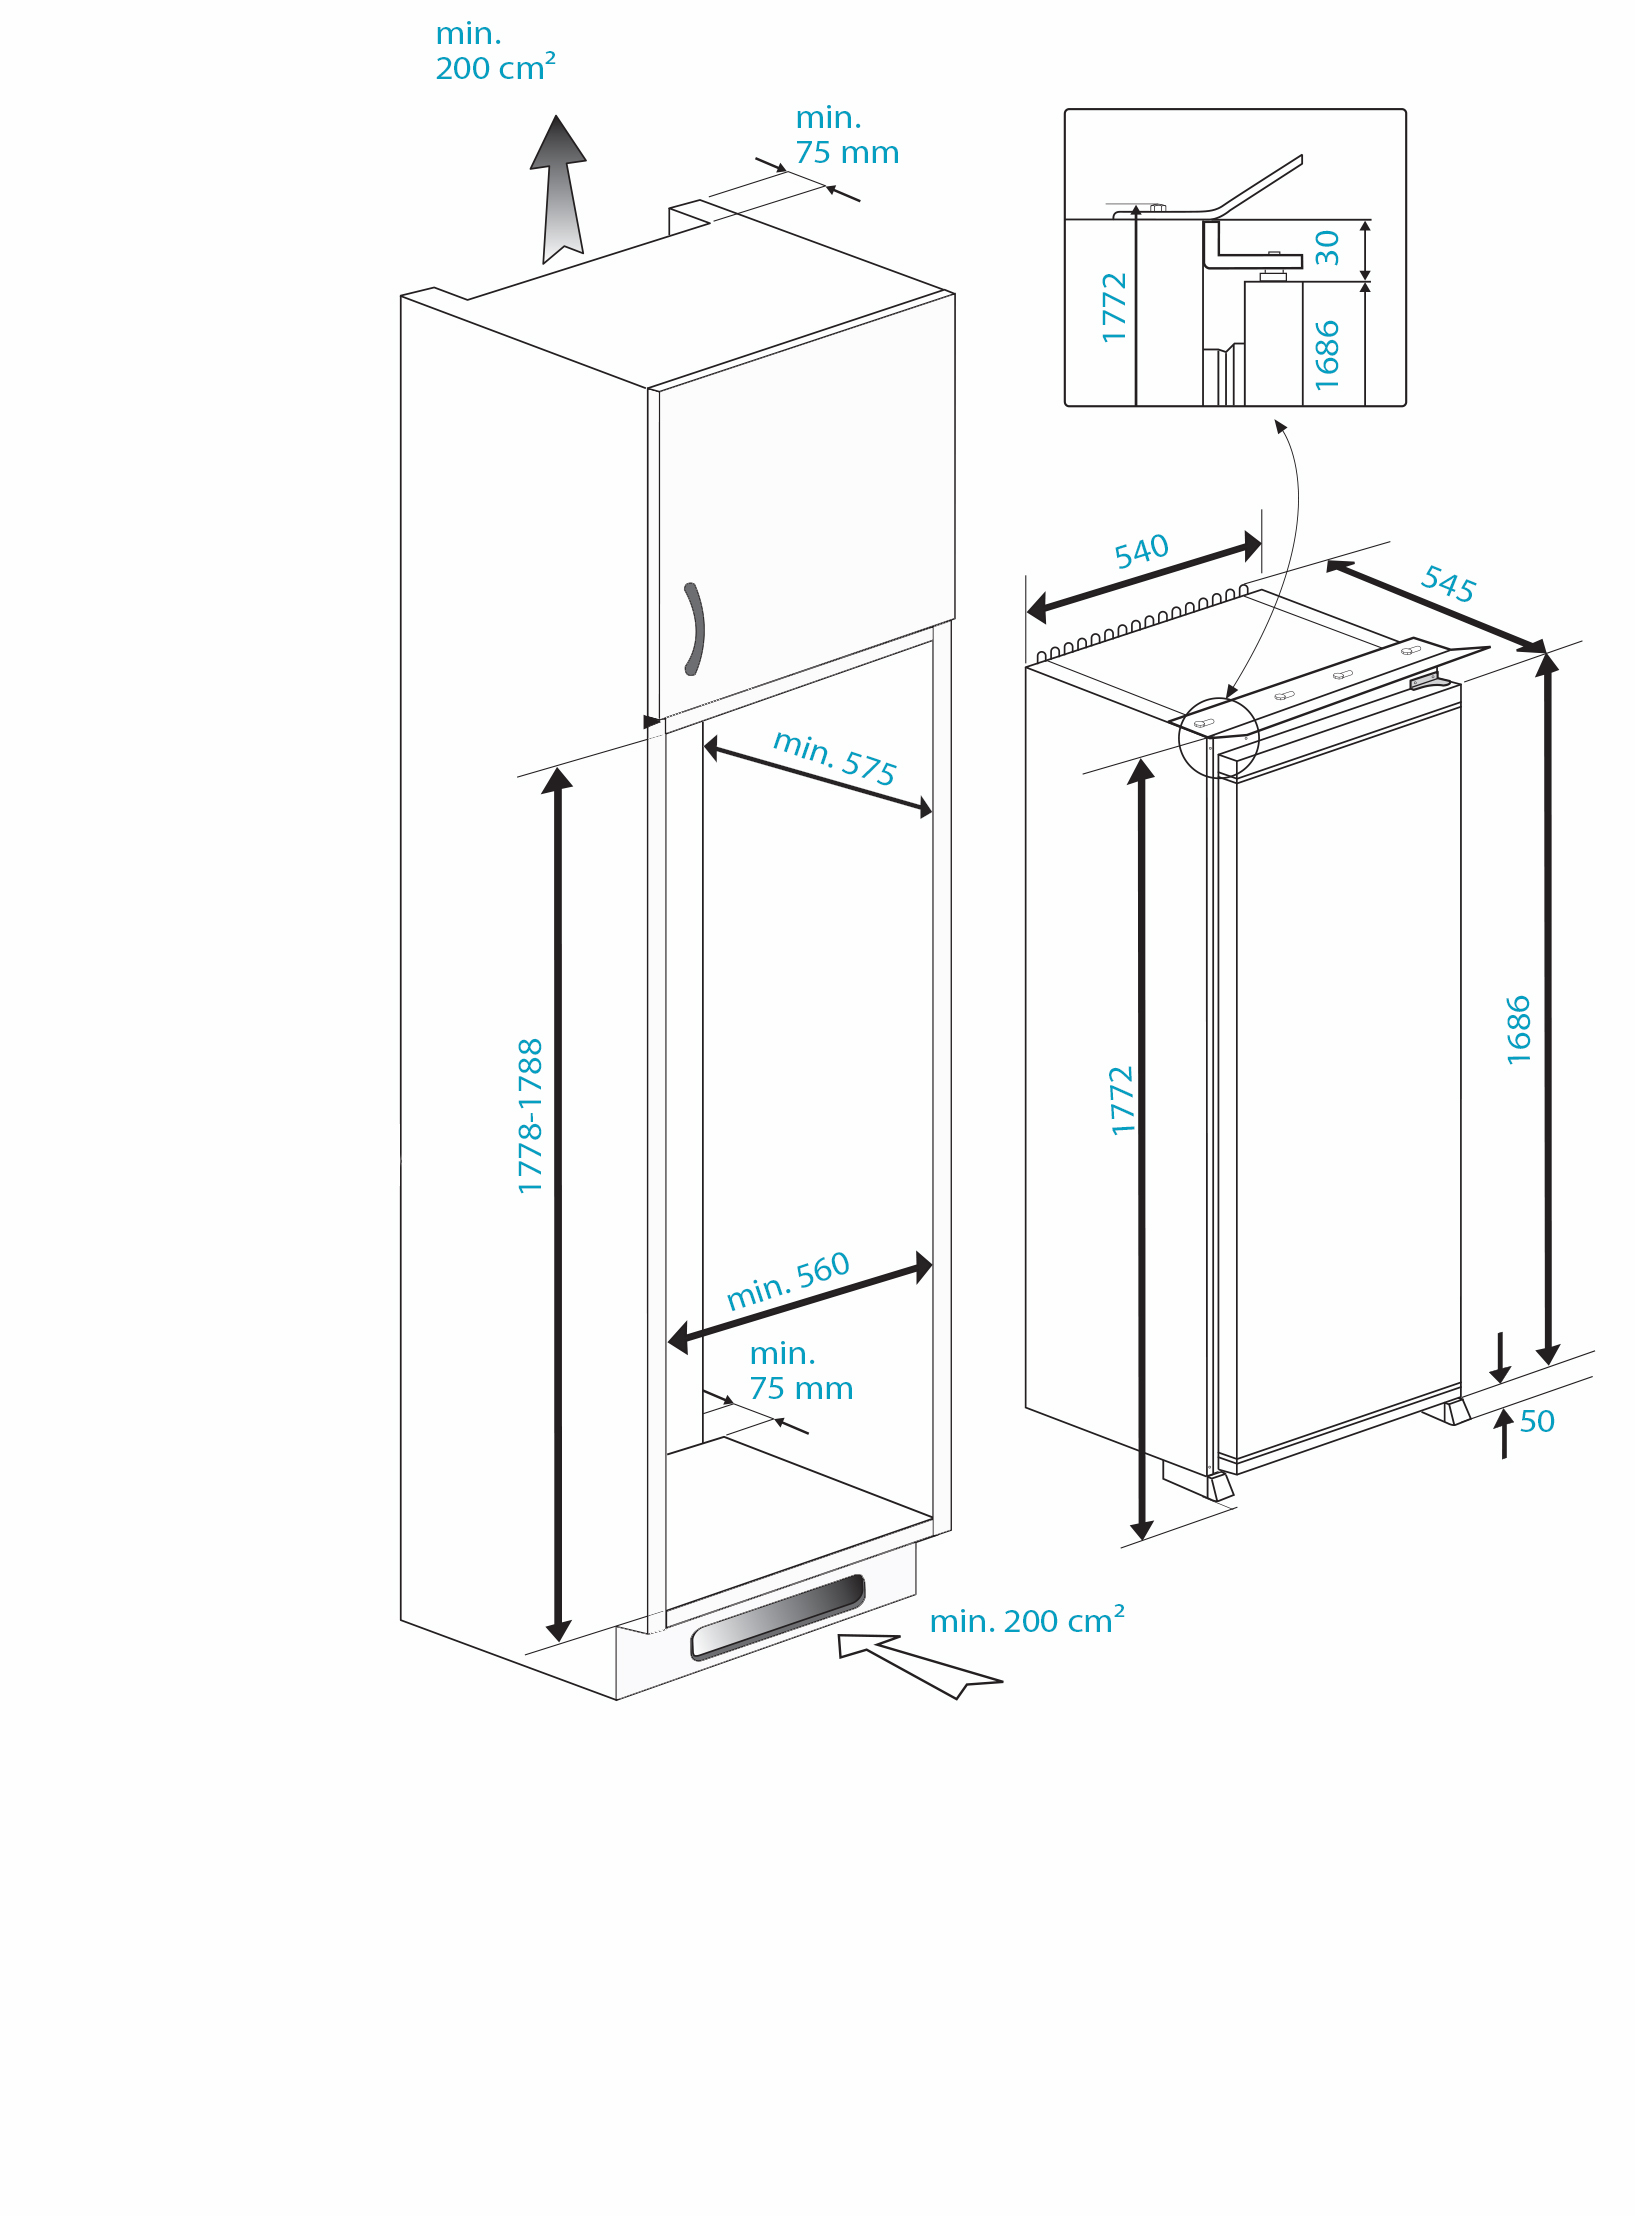 cong lateur beko fbi5850 pas cher. Black Bedroom Furniture Sets. Home Design Ideas